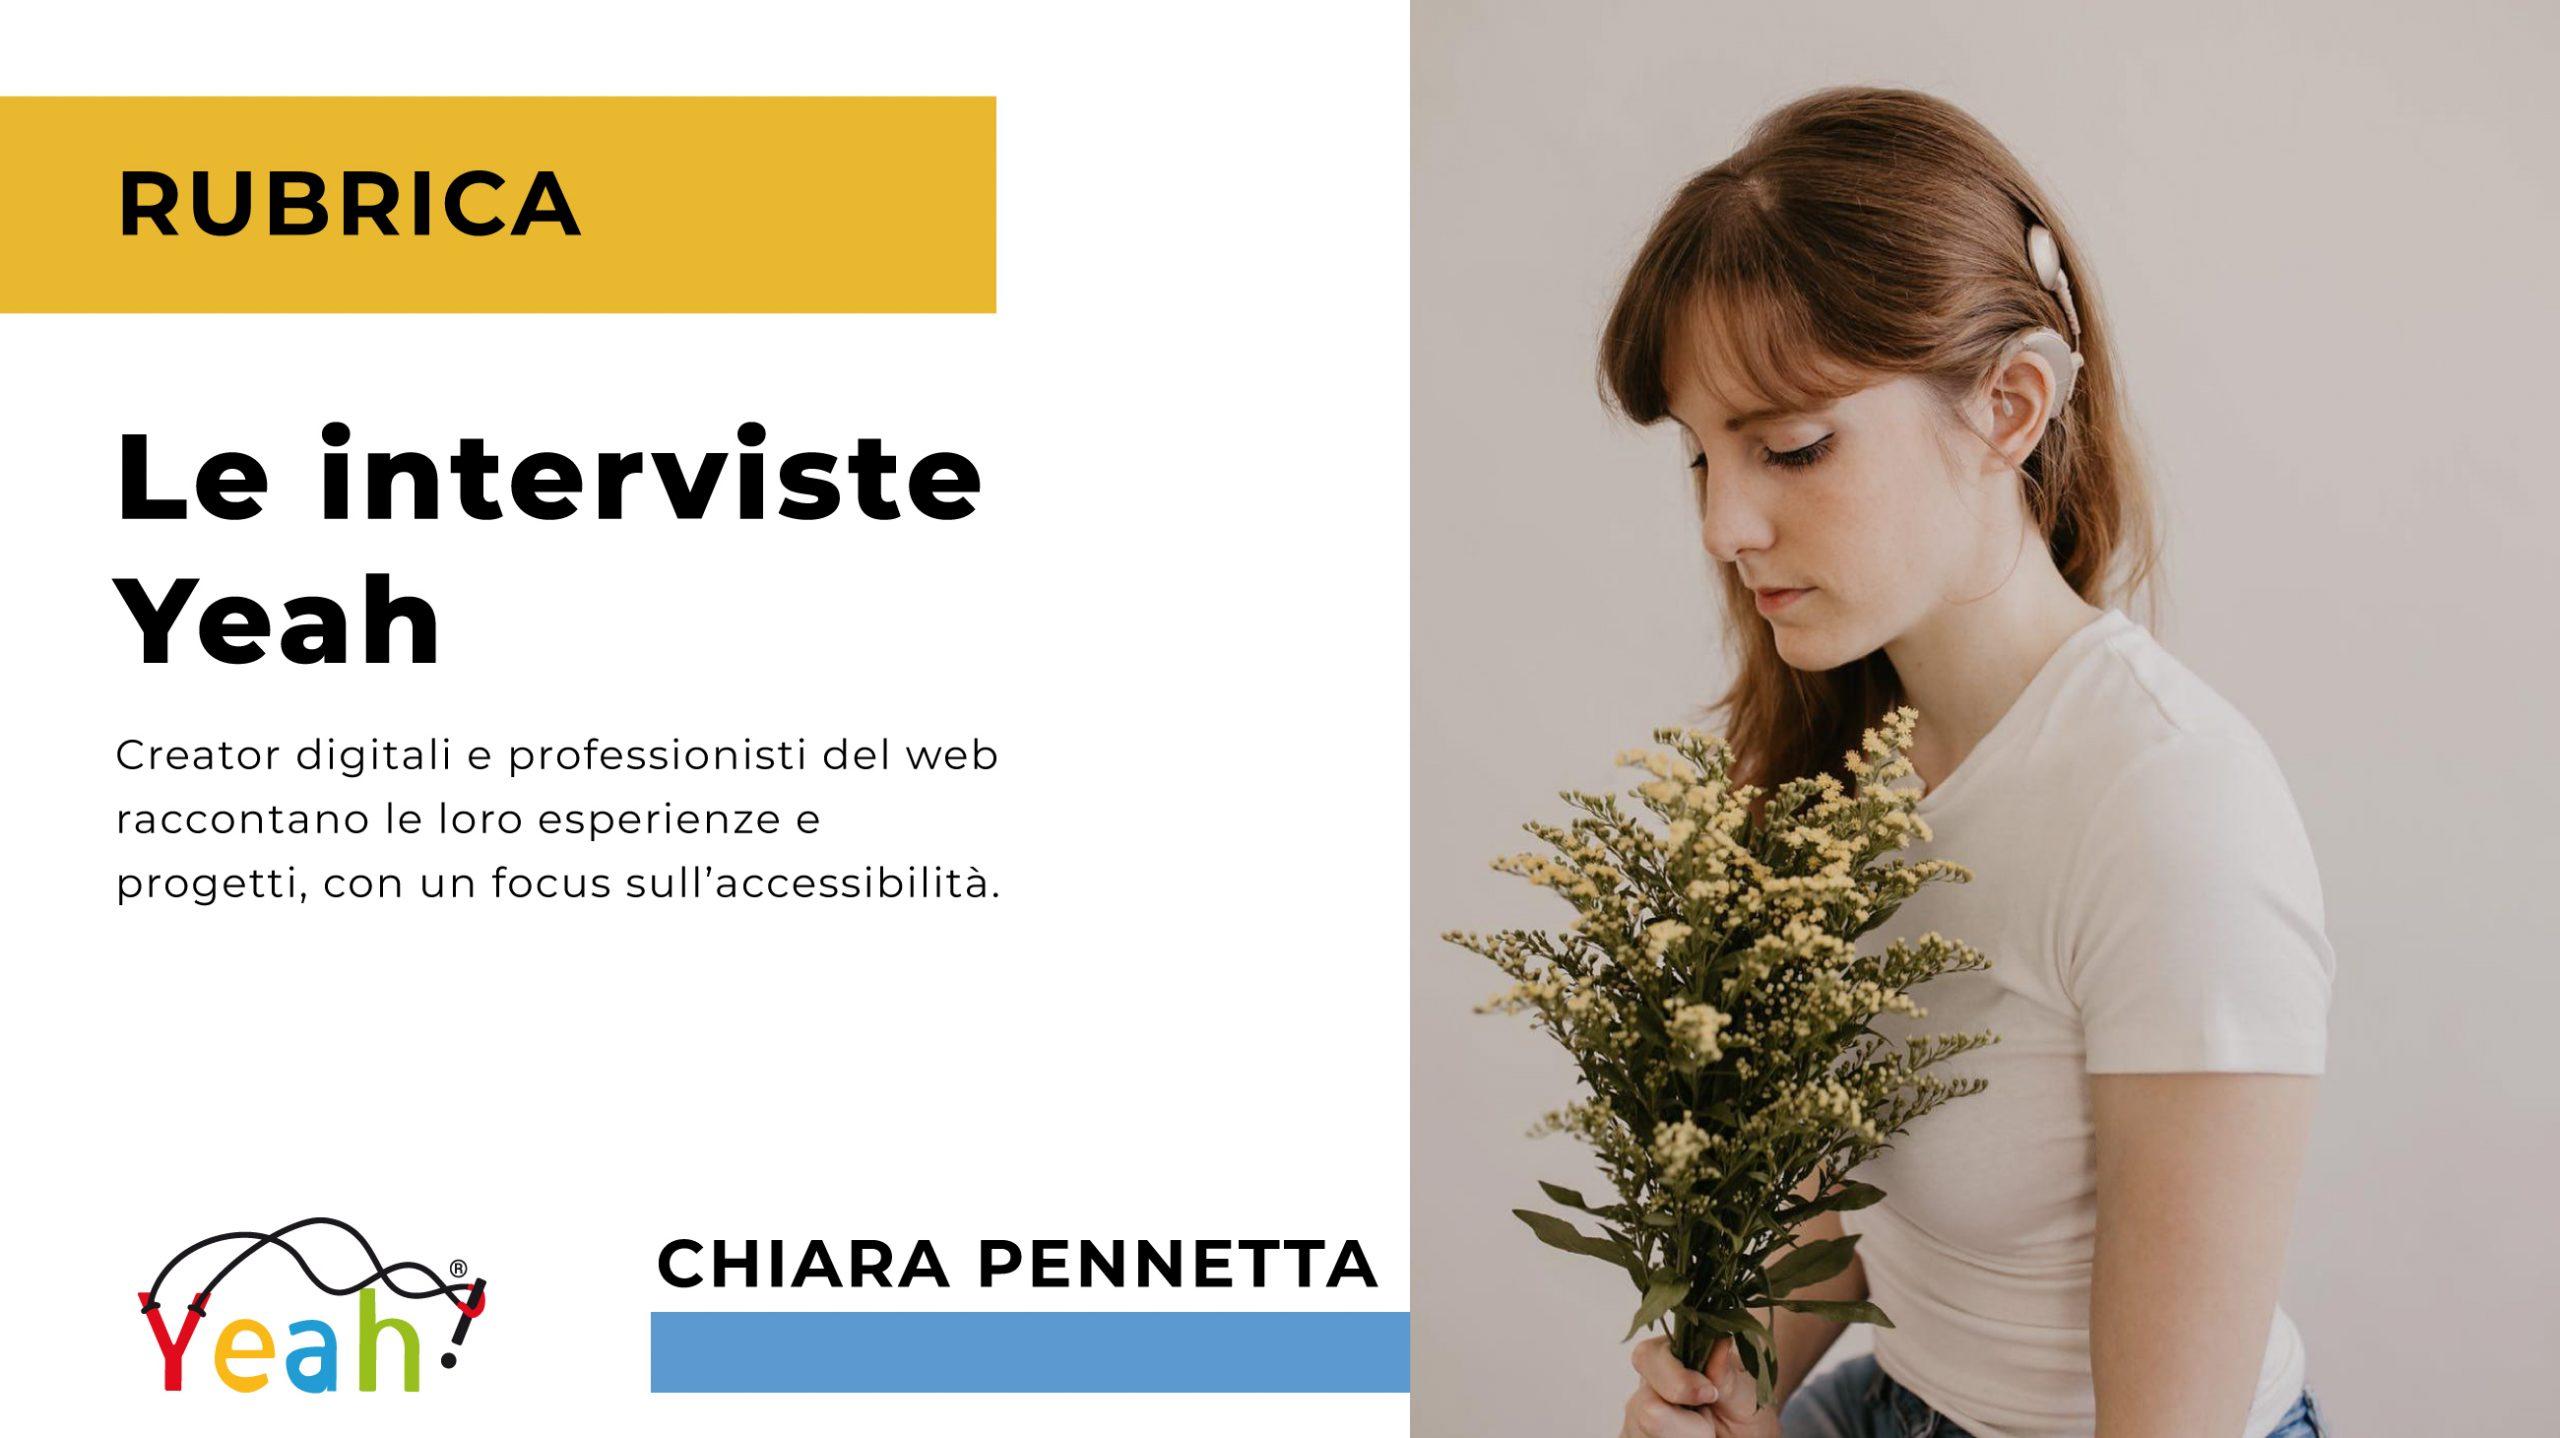 Le interviste Yeah: Chiara Pennetta